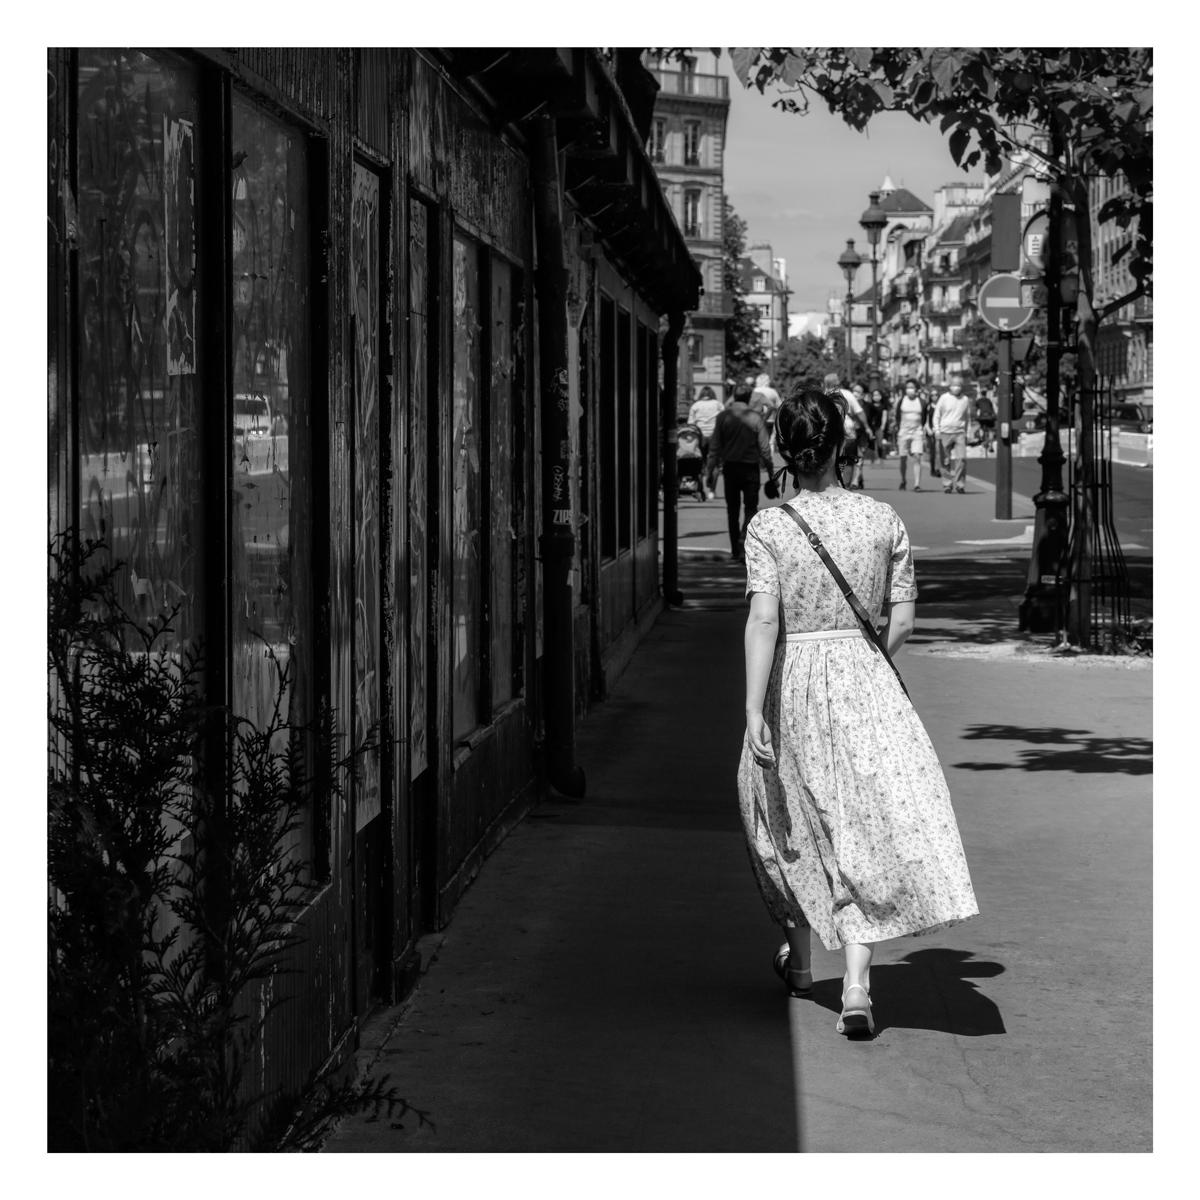 Disparition - Paris.